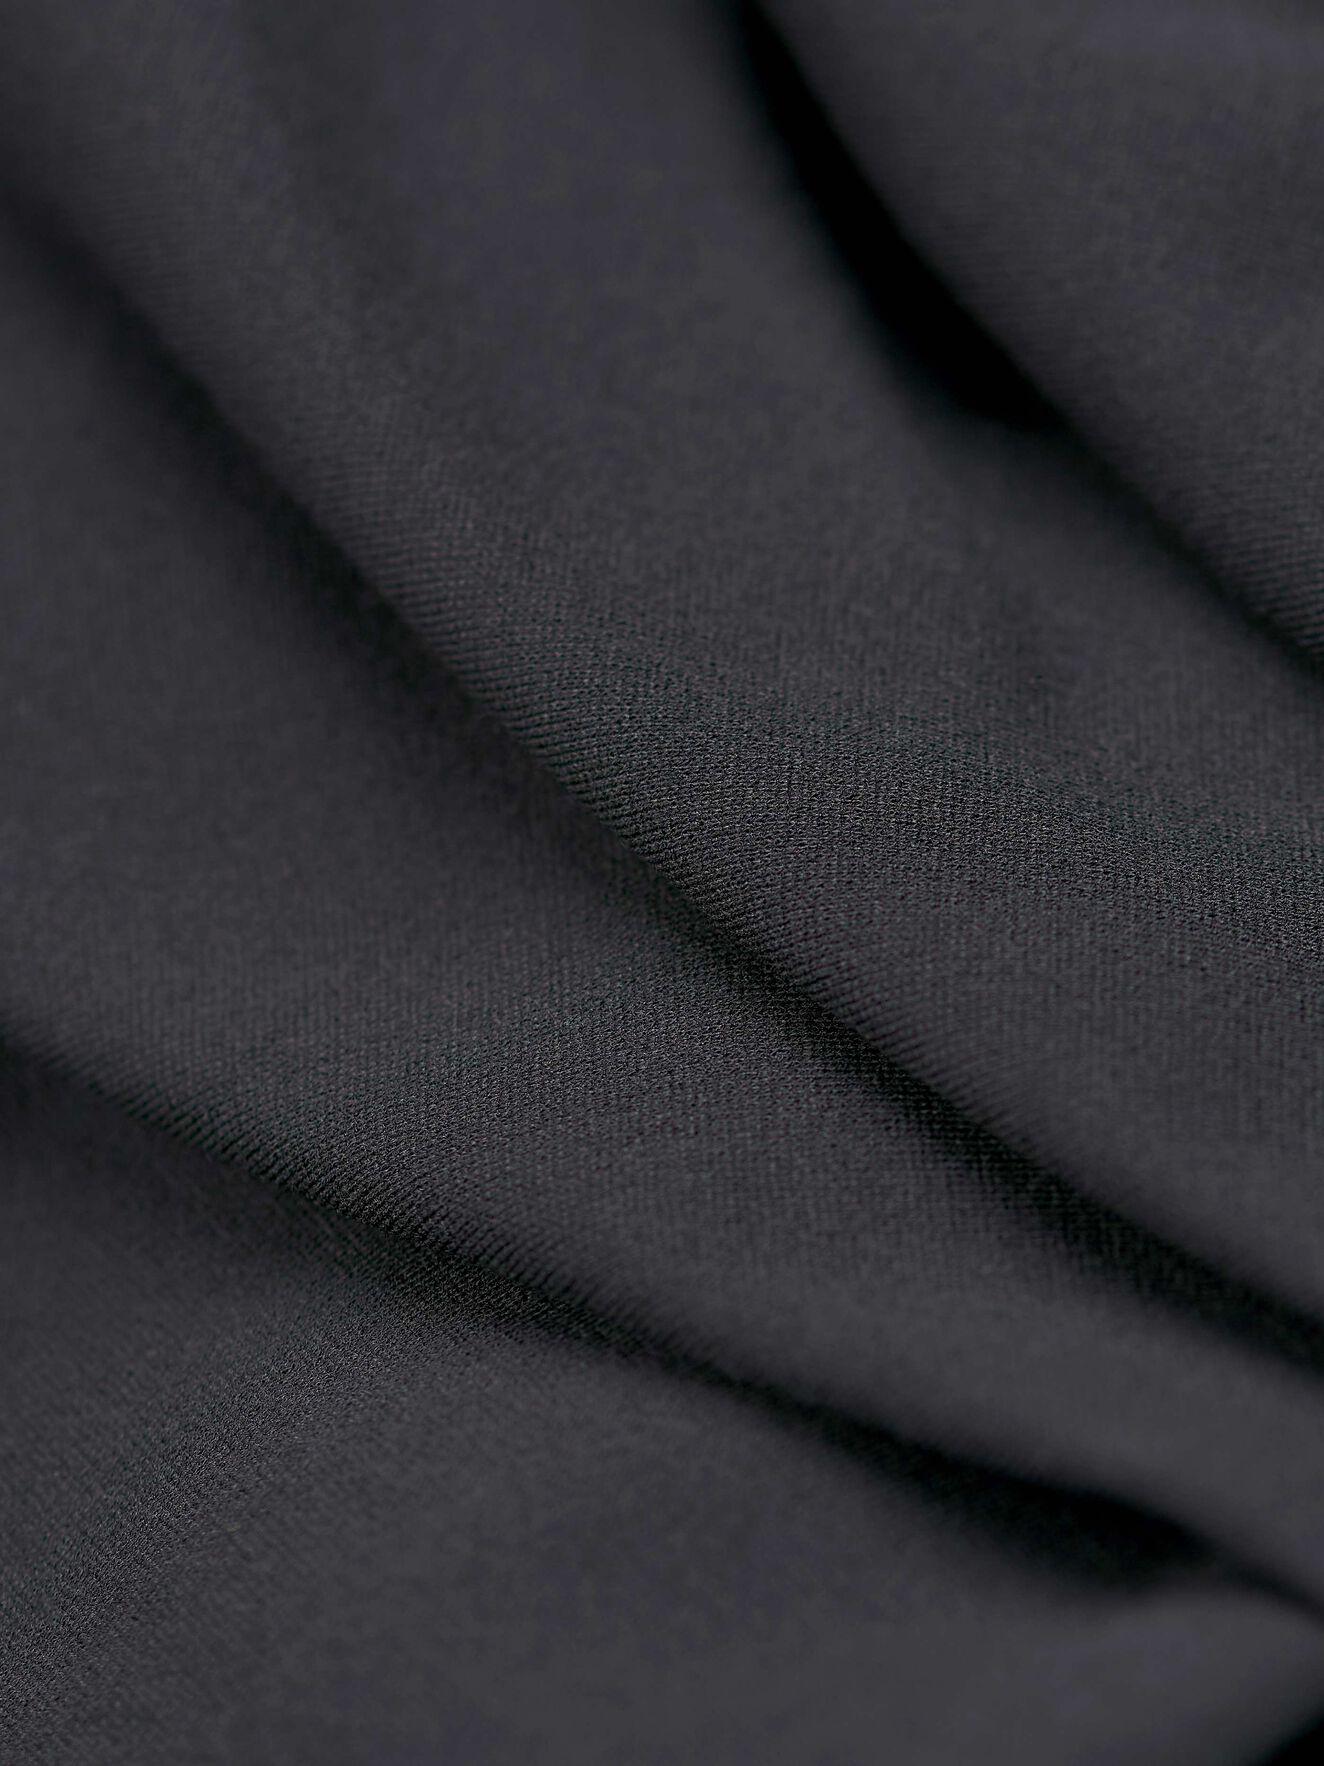 Mi Stretch dress  in Black from Tiger of Sweden